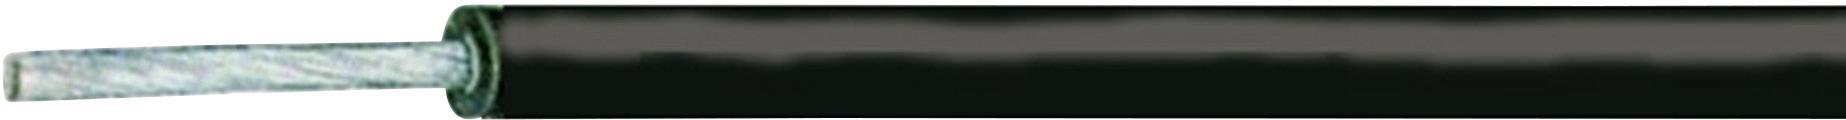 Stikalna žica SiL-SiAF 1 x 1.50 mm, rdeča XBK Kabel cena za meter